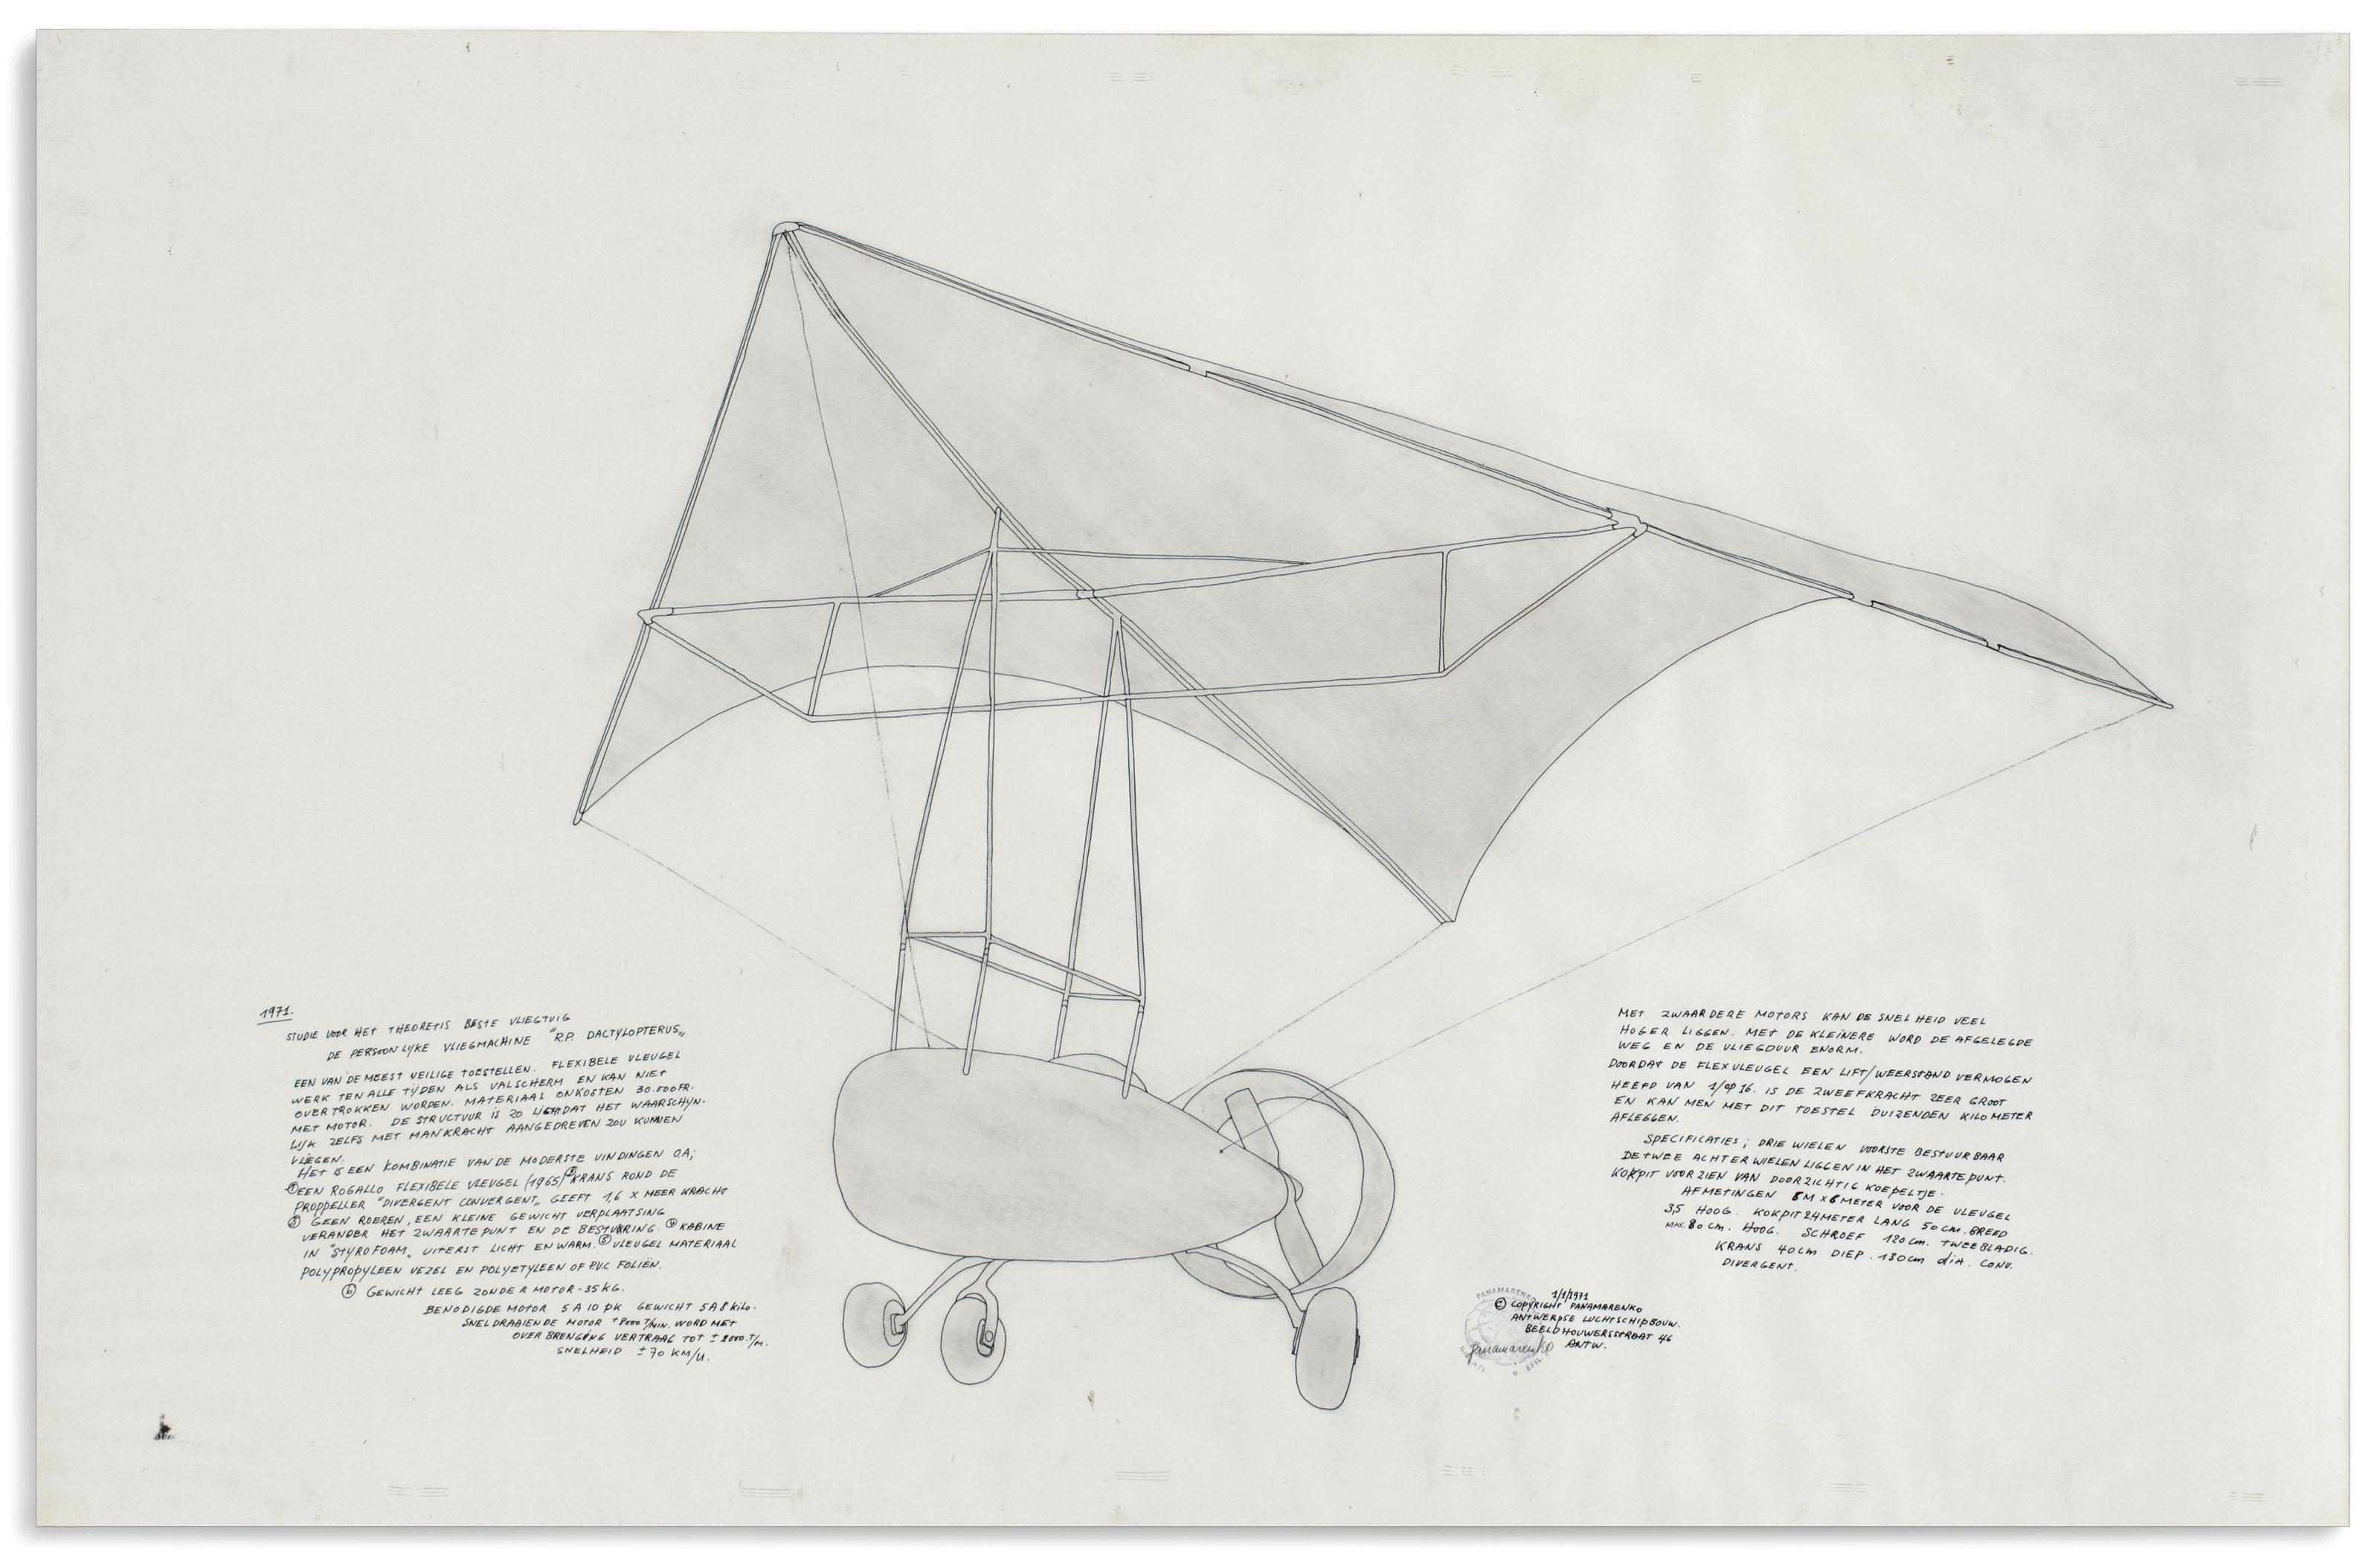 Studie voor het theoretis beste vliegtuig (Study for the Best Theoretical Airplane)